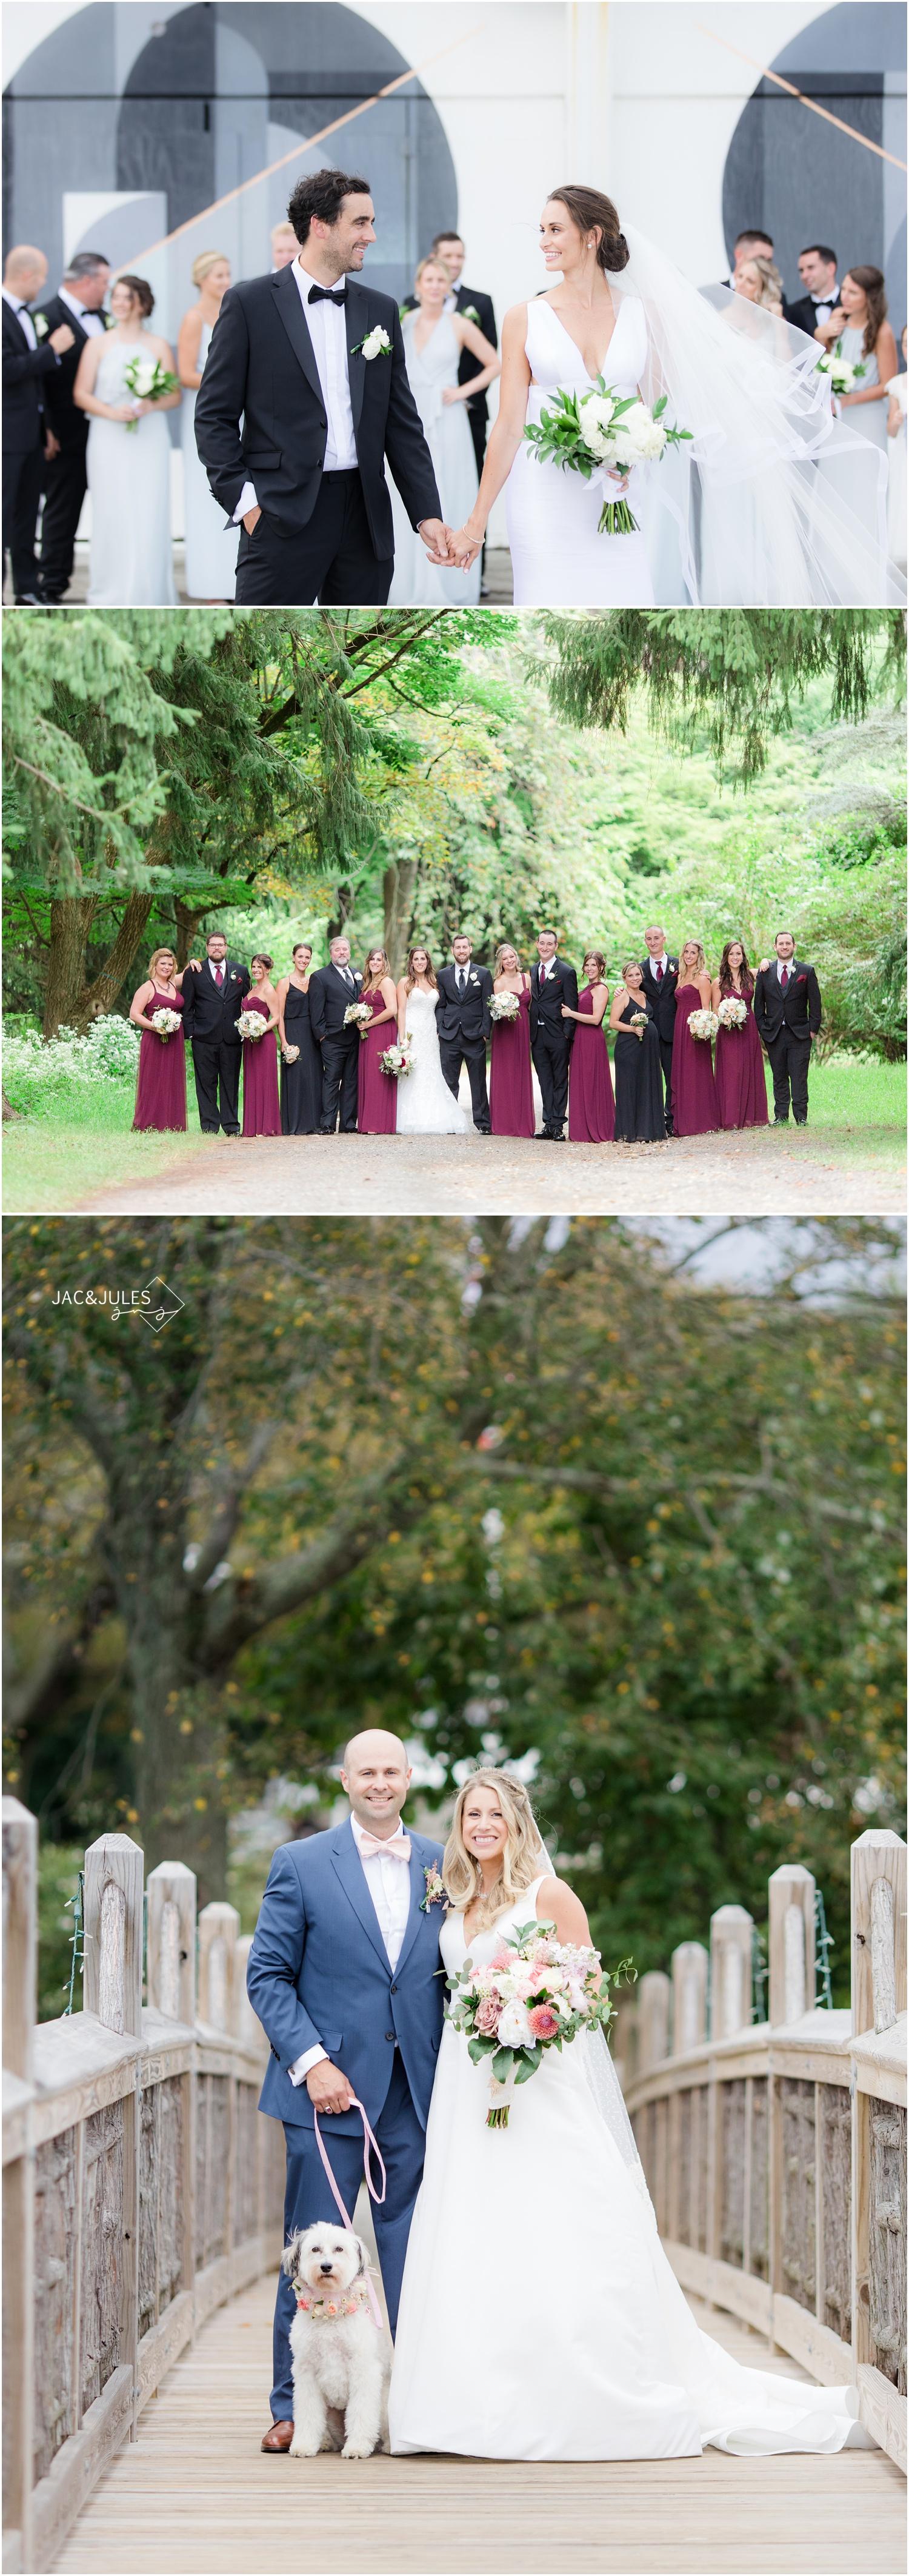 Wedding photos at The Berkeley in Asbury Park, plus Cross Estate Gardens wedding photos, and wedding portraits in Spring Lake.